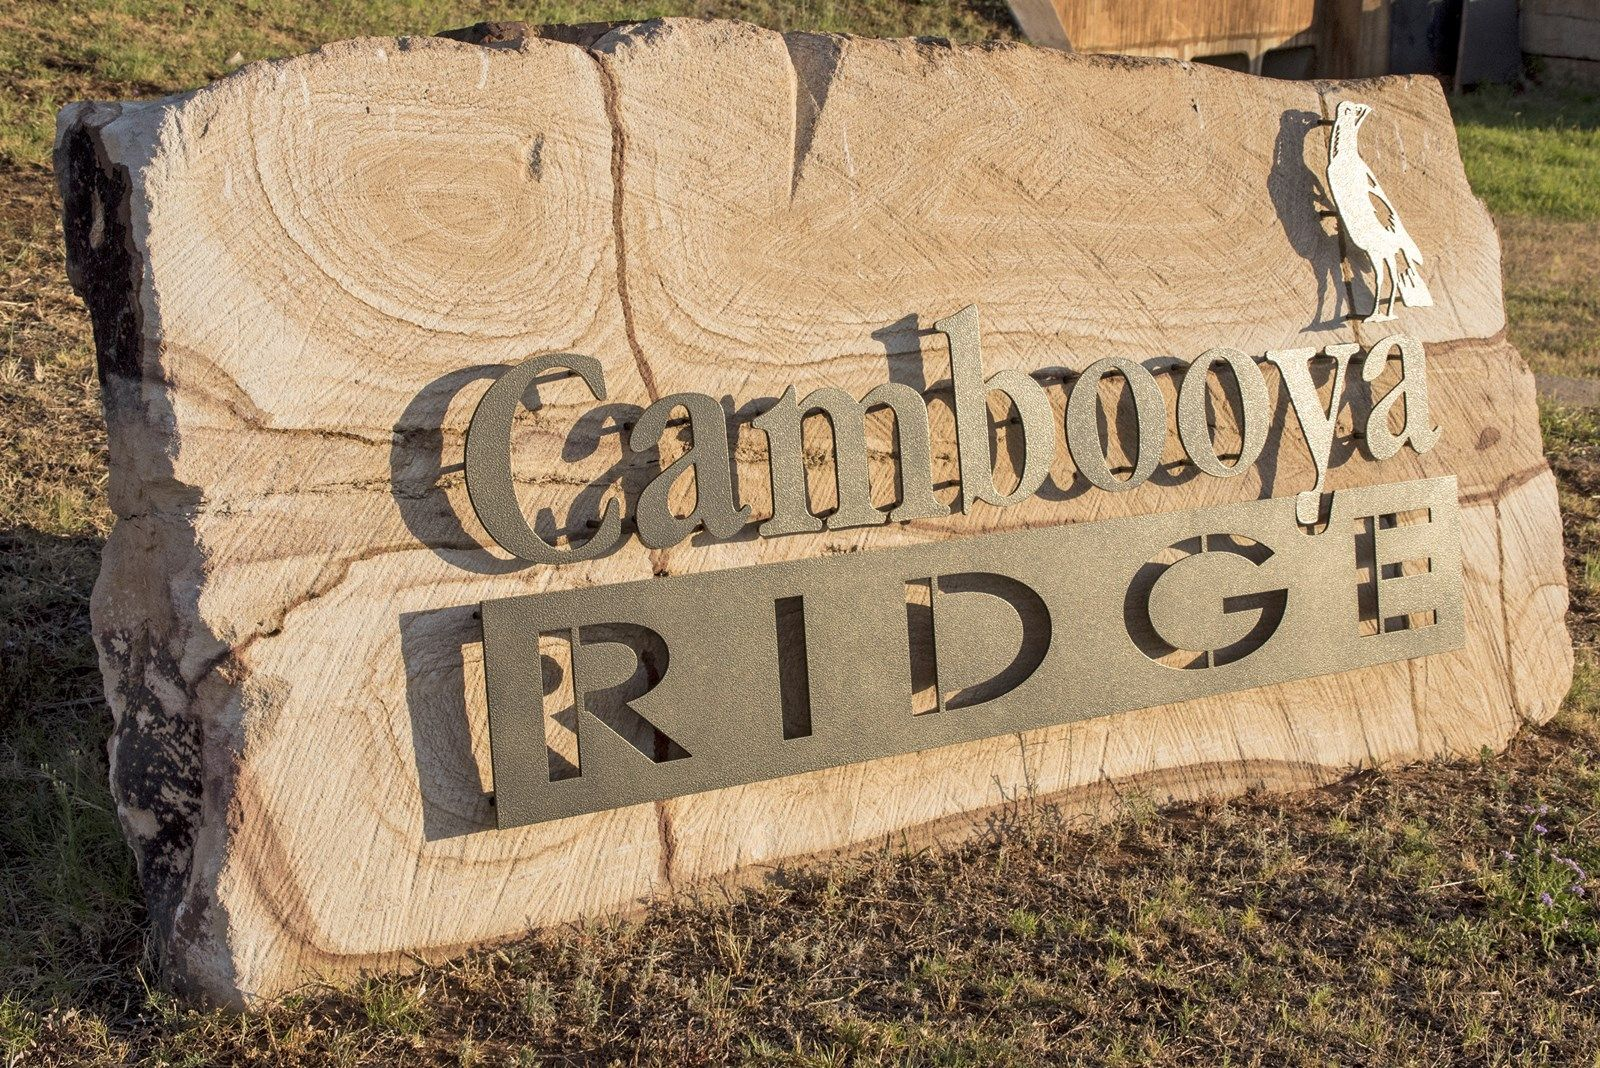 Ridge Drive, Cambooya, QLD 4358, Image 0